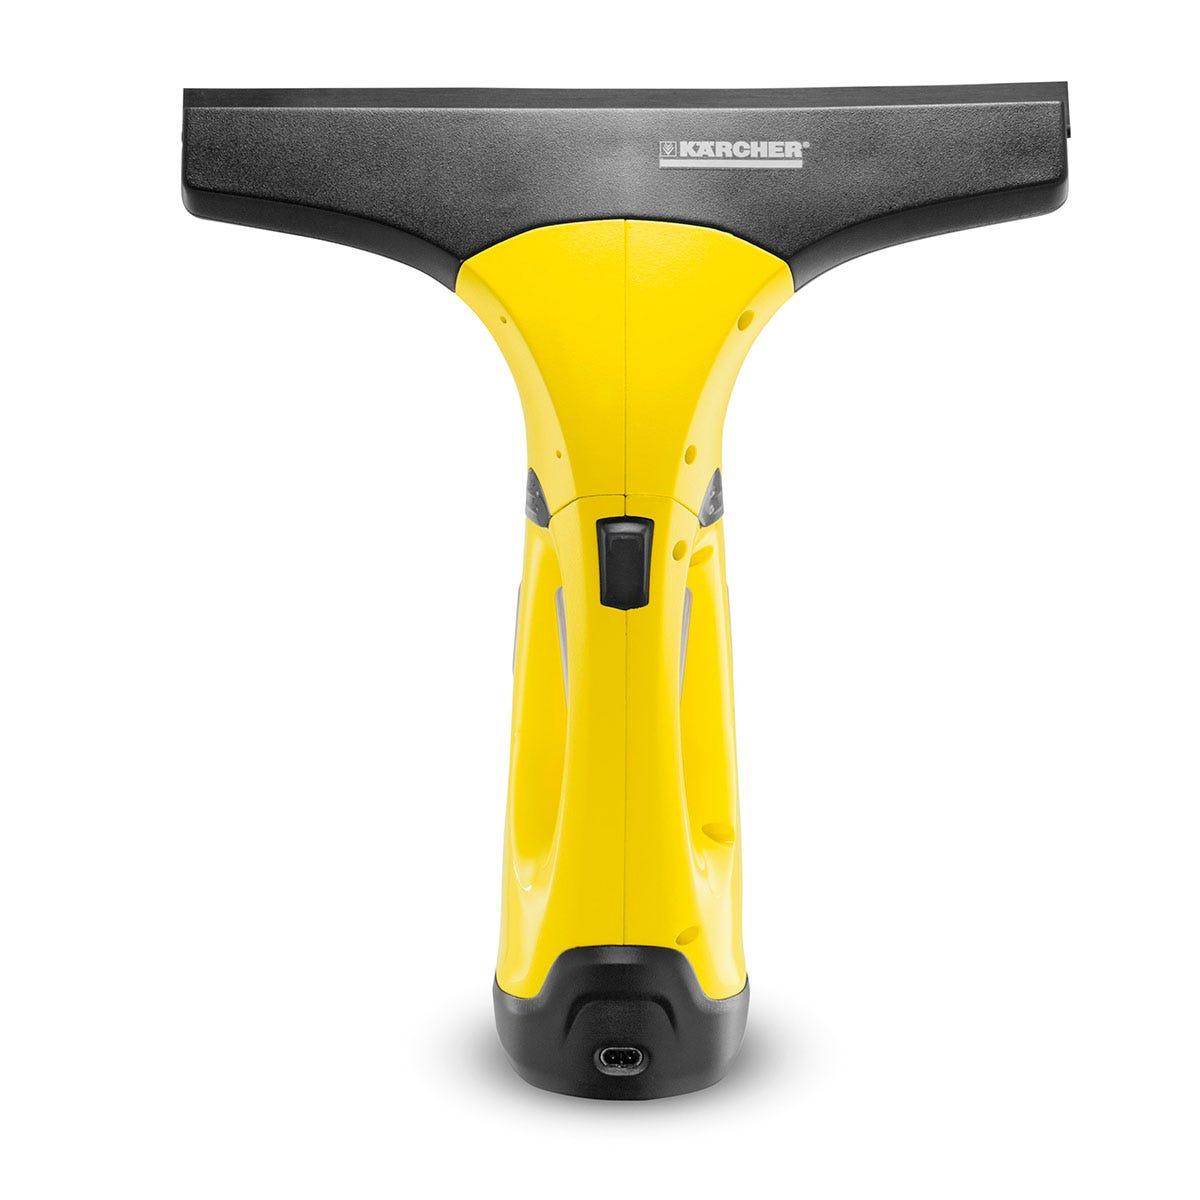 Karcher 16332200 WV 2 Plus Window Vacuum Cleaner - Yellow/Black